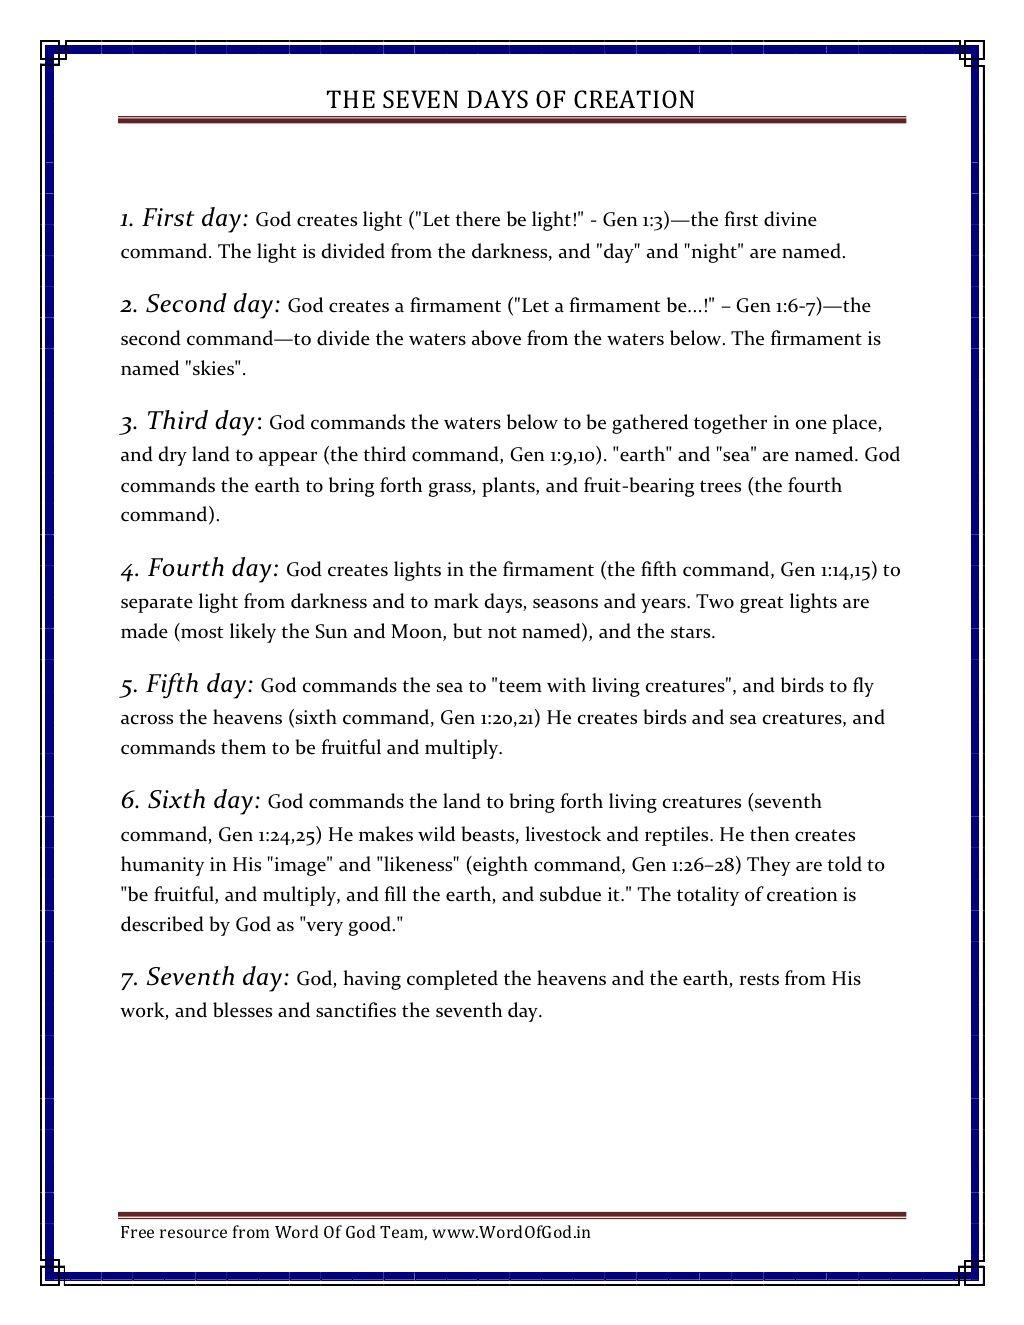 7-daysofcreation by yesudas.rs via Slideshare